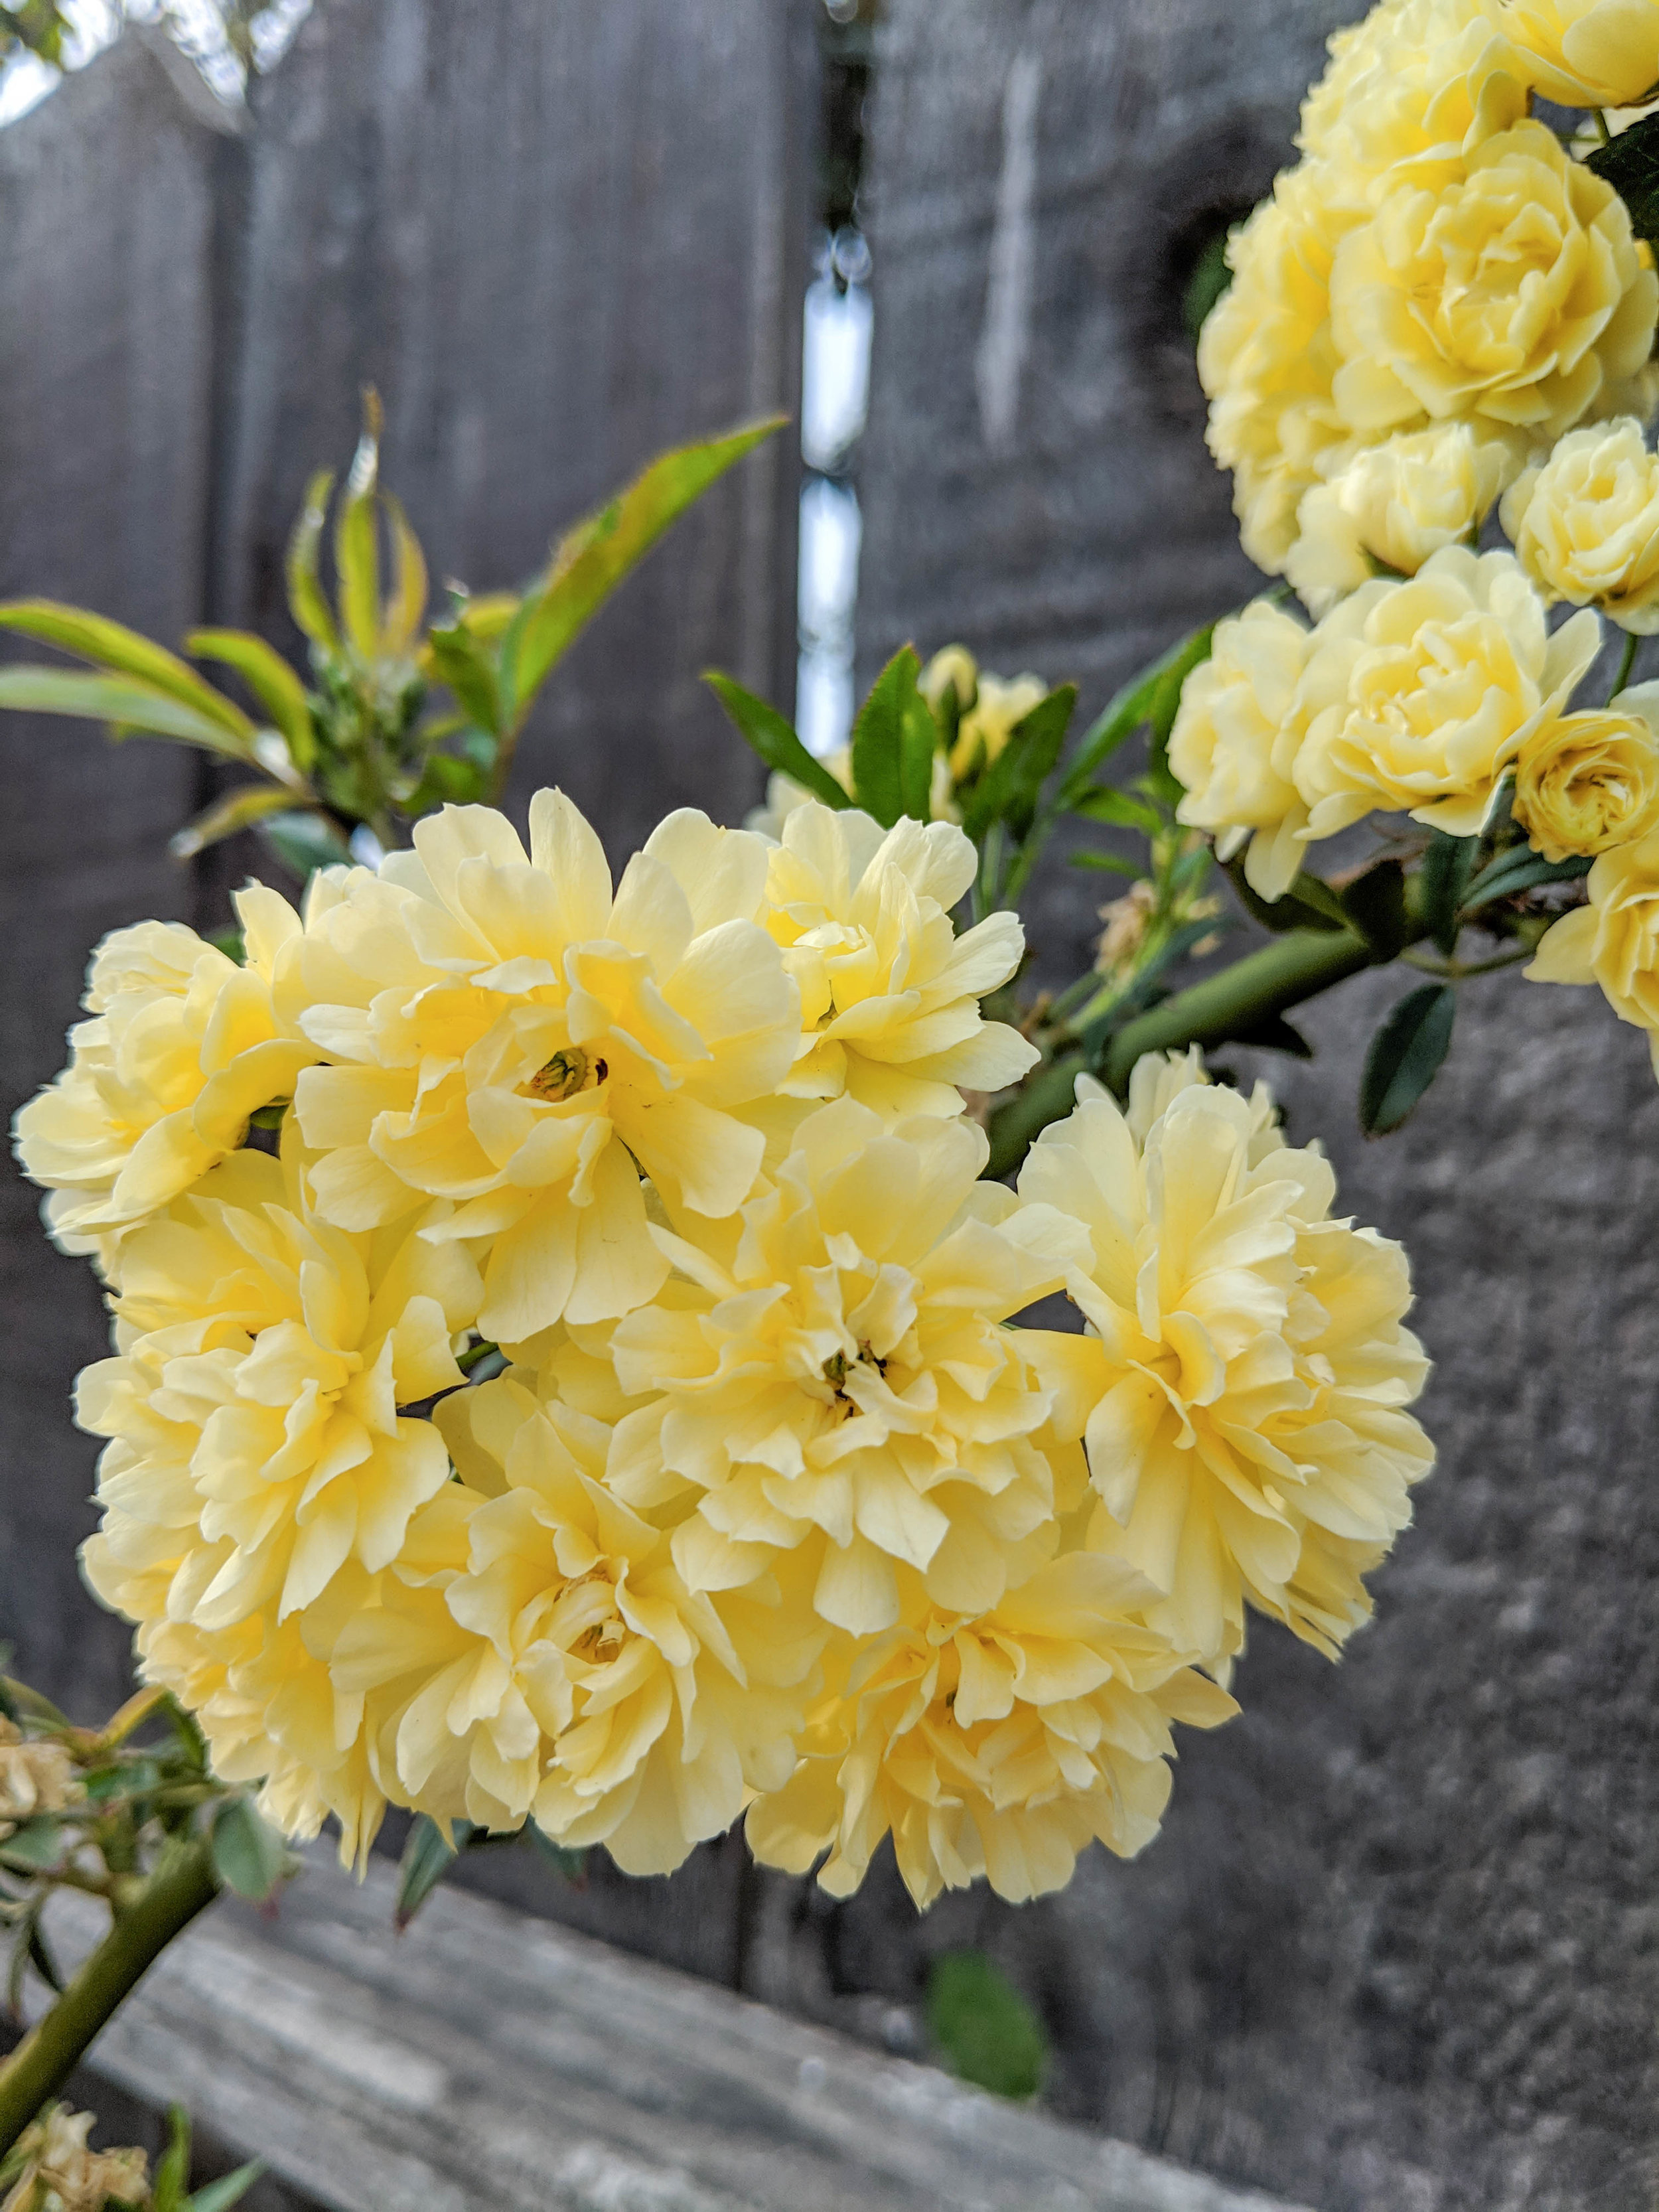 bri rinehart; photography; photography series; flowers; spring